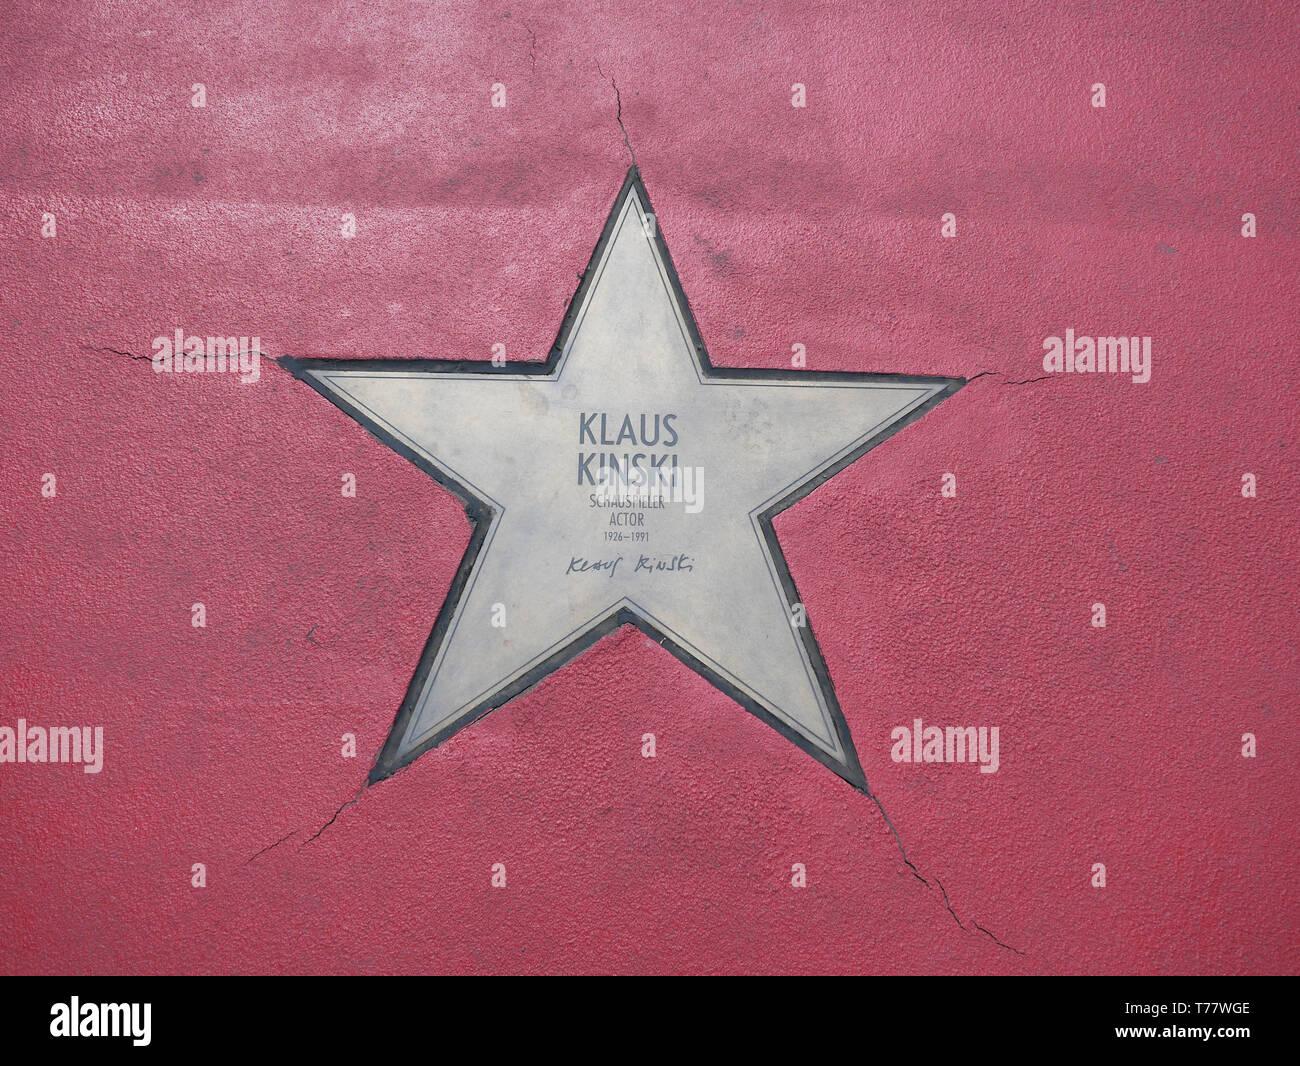 BERLIN, GERMANY - MAY 4, 2019: Star of Klaus Kinski At Boulevard der Stars, Walk of Fame In Berlin, Germany Stock Photo